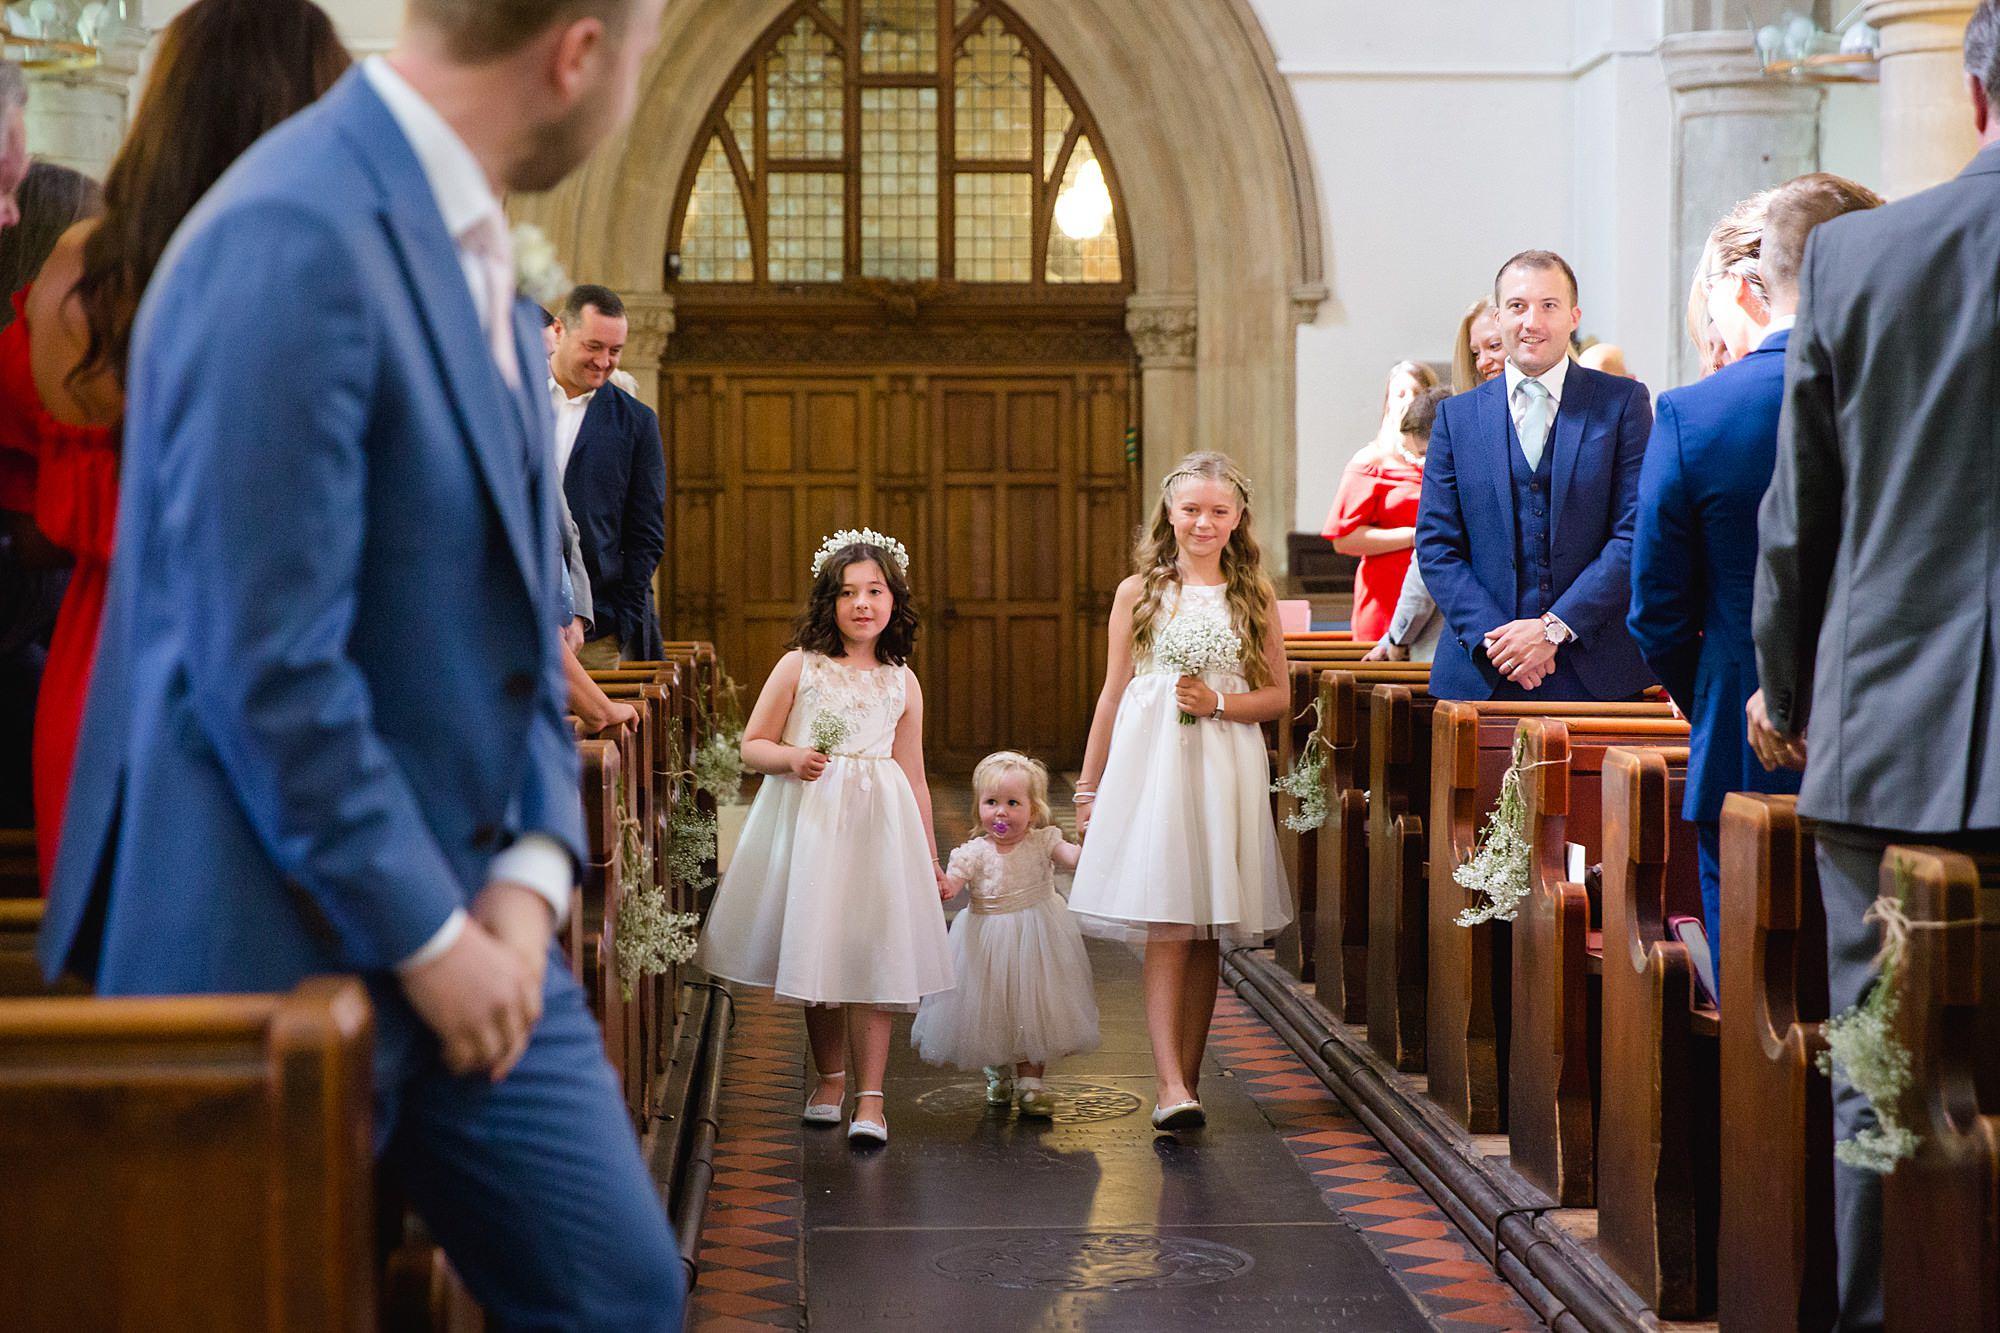 Writtle university college wedding flower girls walk down aisle